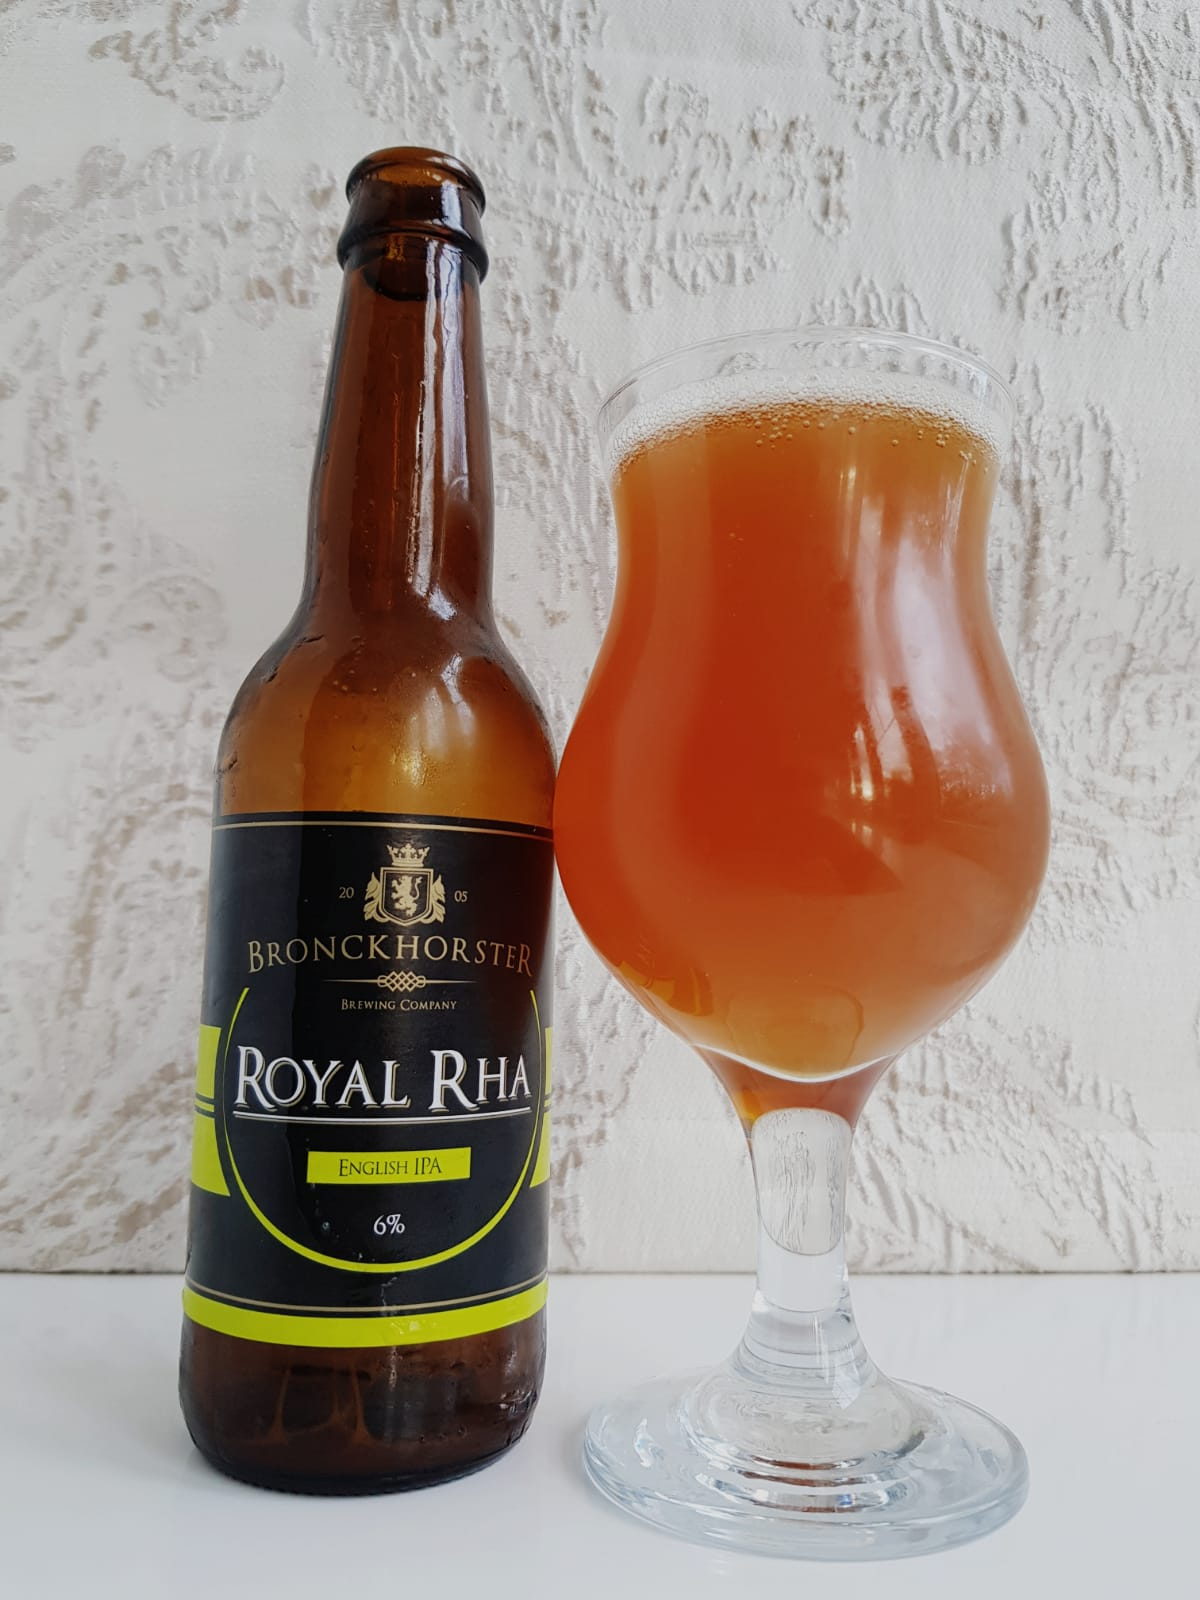 ROYAL RHA